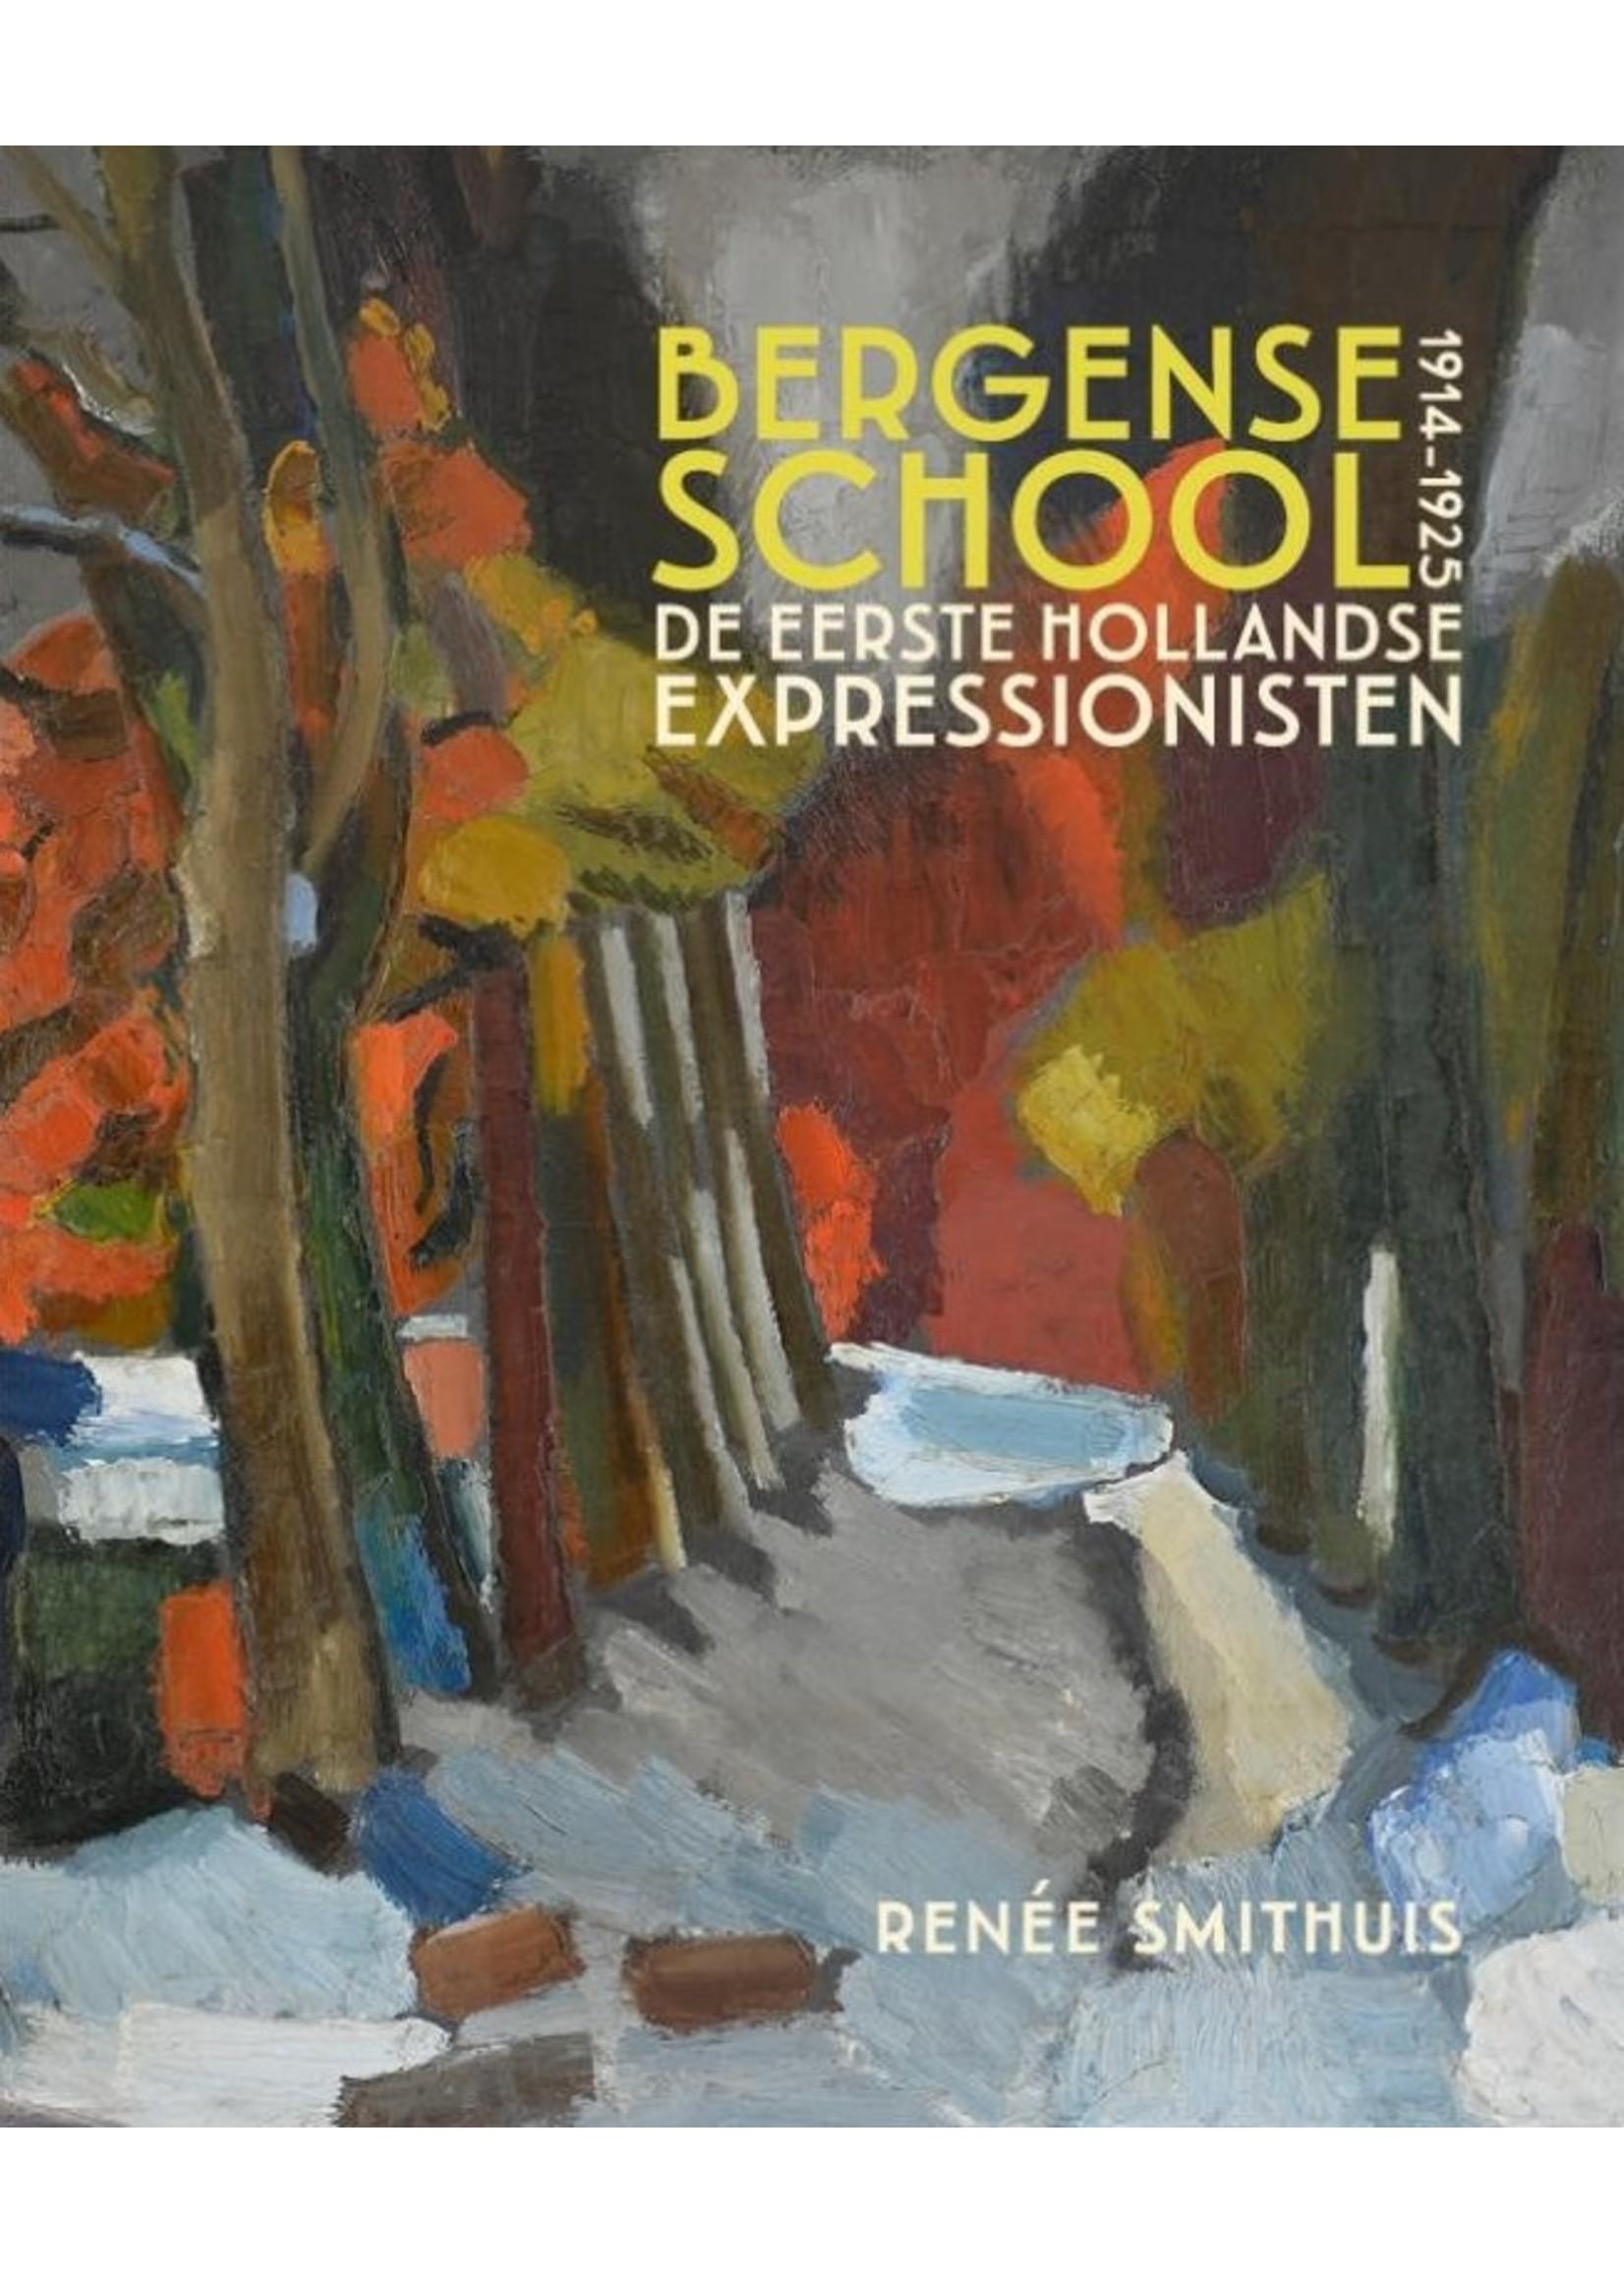 Bergen School the first Dutch Epressionists 1914-1925 Renee Smithuis